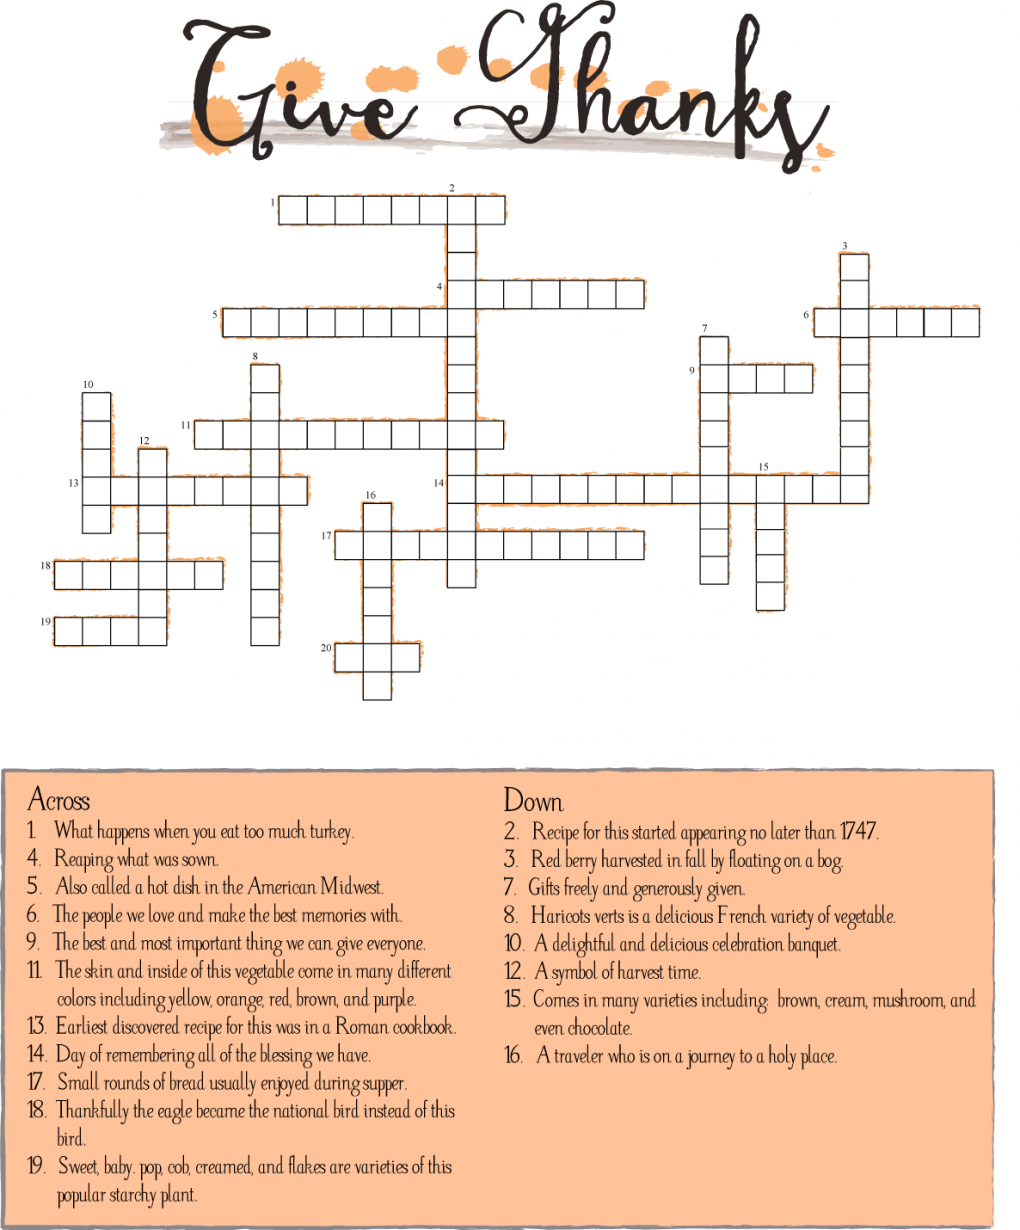 10 Superfun Thanksgiving Crossword Puzzles | Kittybabylove - Thanksgiving Crossword Puzzles Printable Free